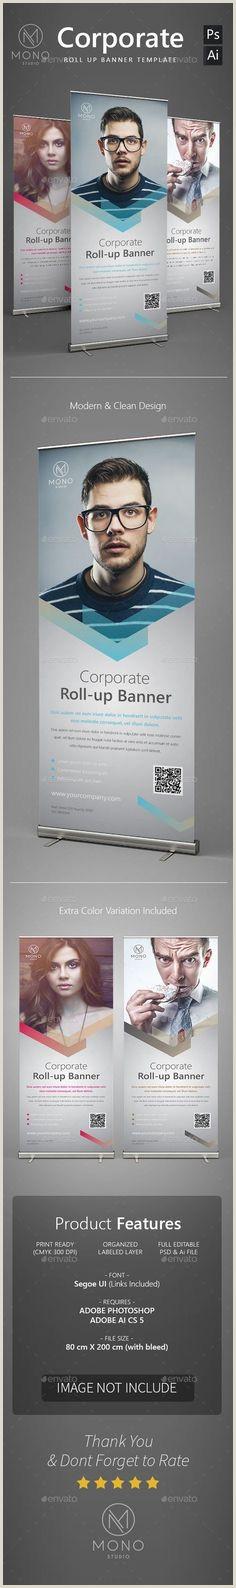 Retractable Banner Vistaprint 10 Best Banner Ad Design Images